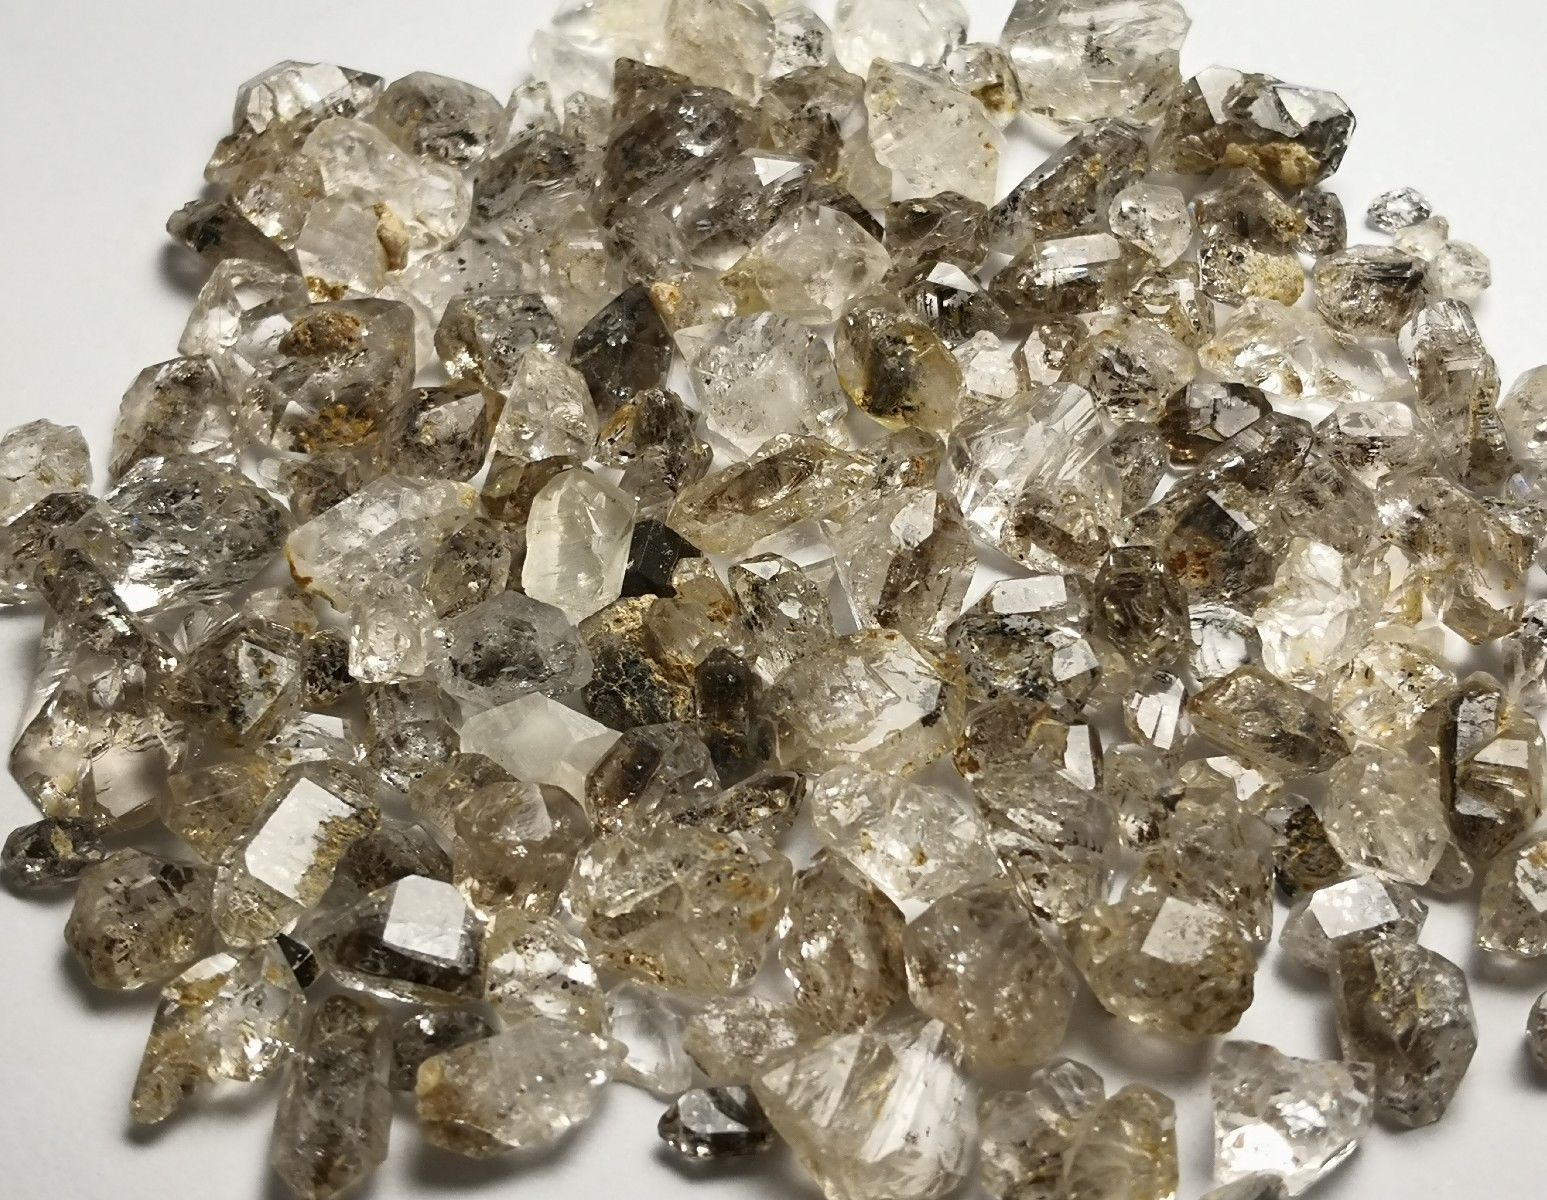 köpa kristaller online